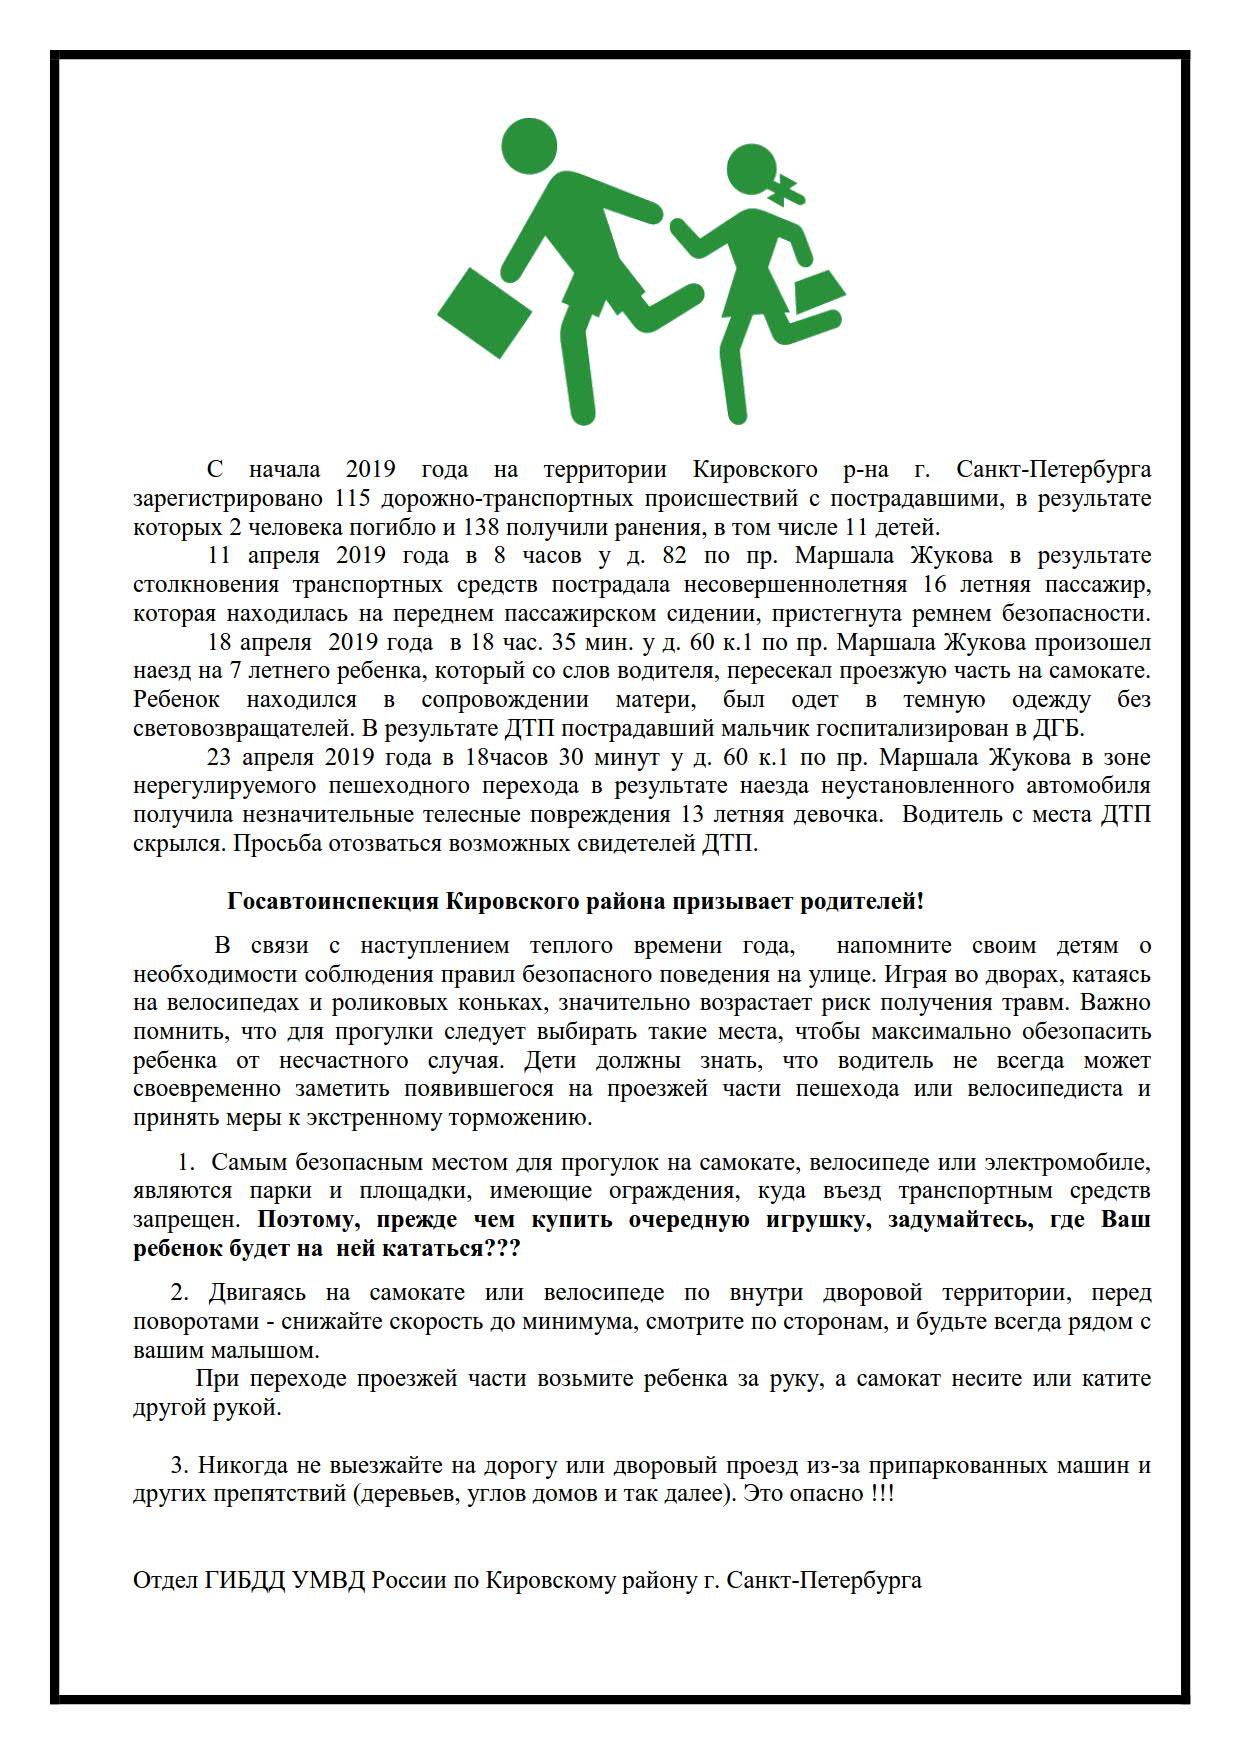 ДДТТ, хроника дтп дети. Самокаты.апрель_1